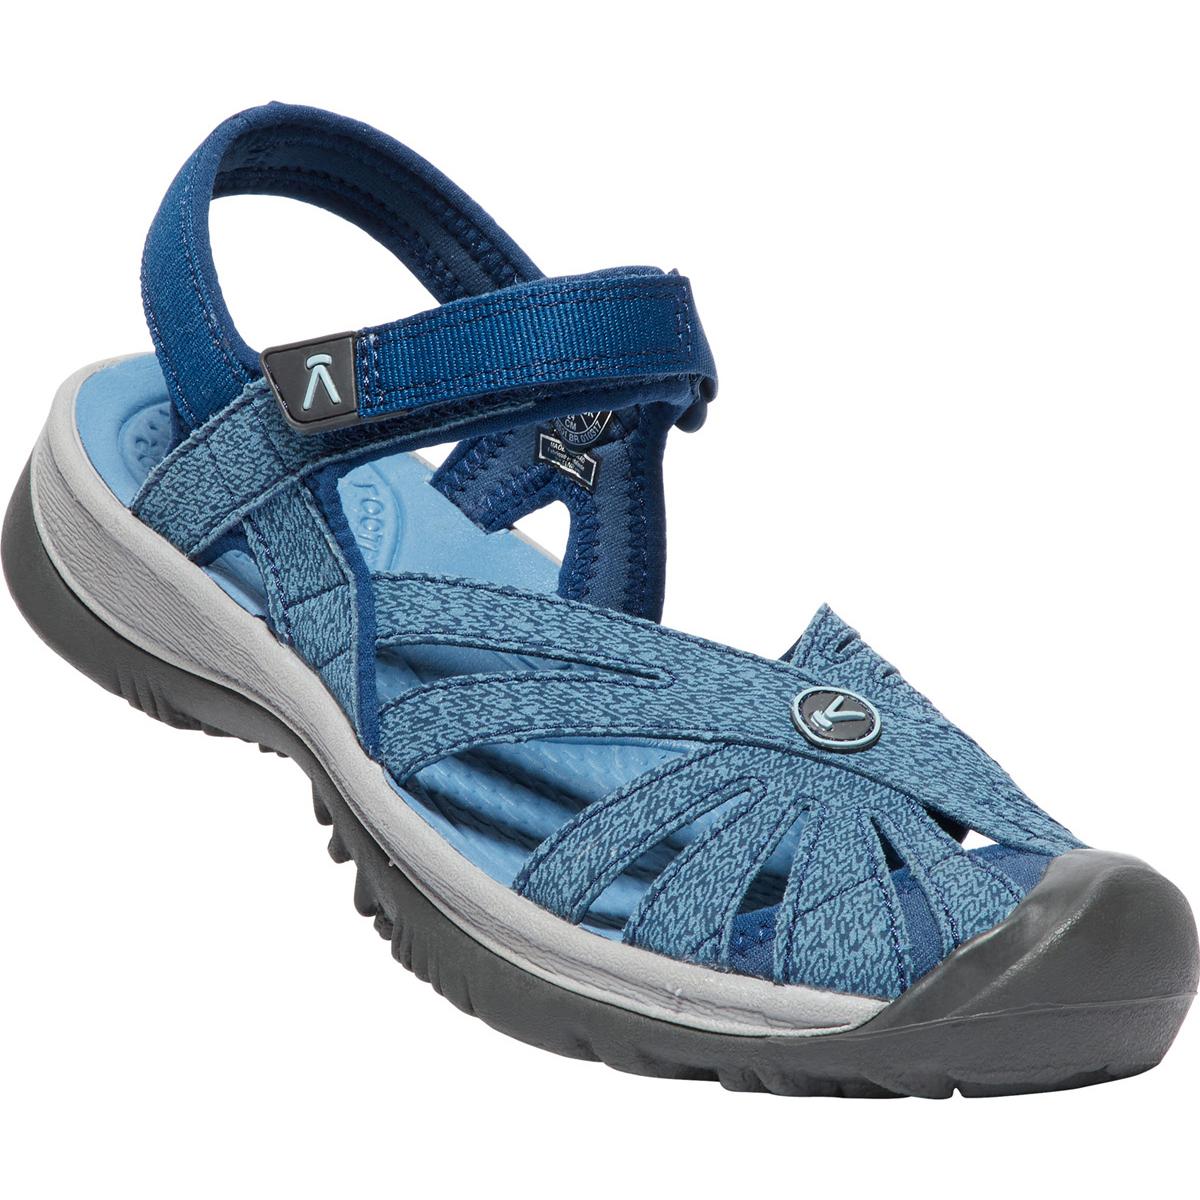 Keen Women's Rose Sandal - Blue, 6.5